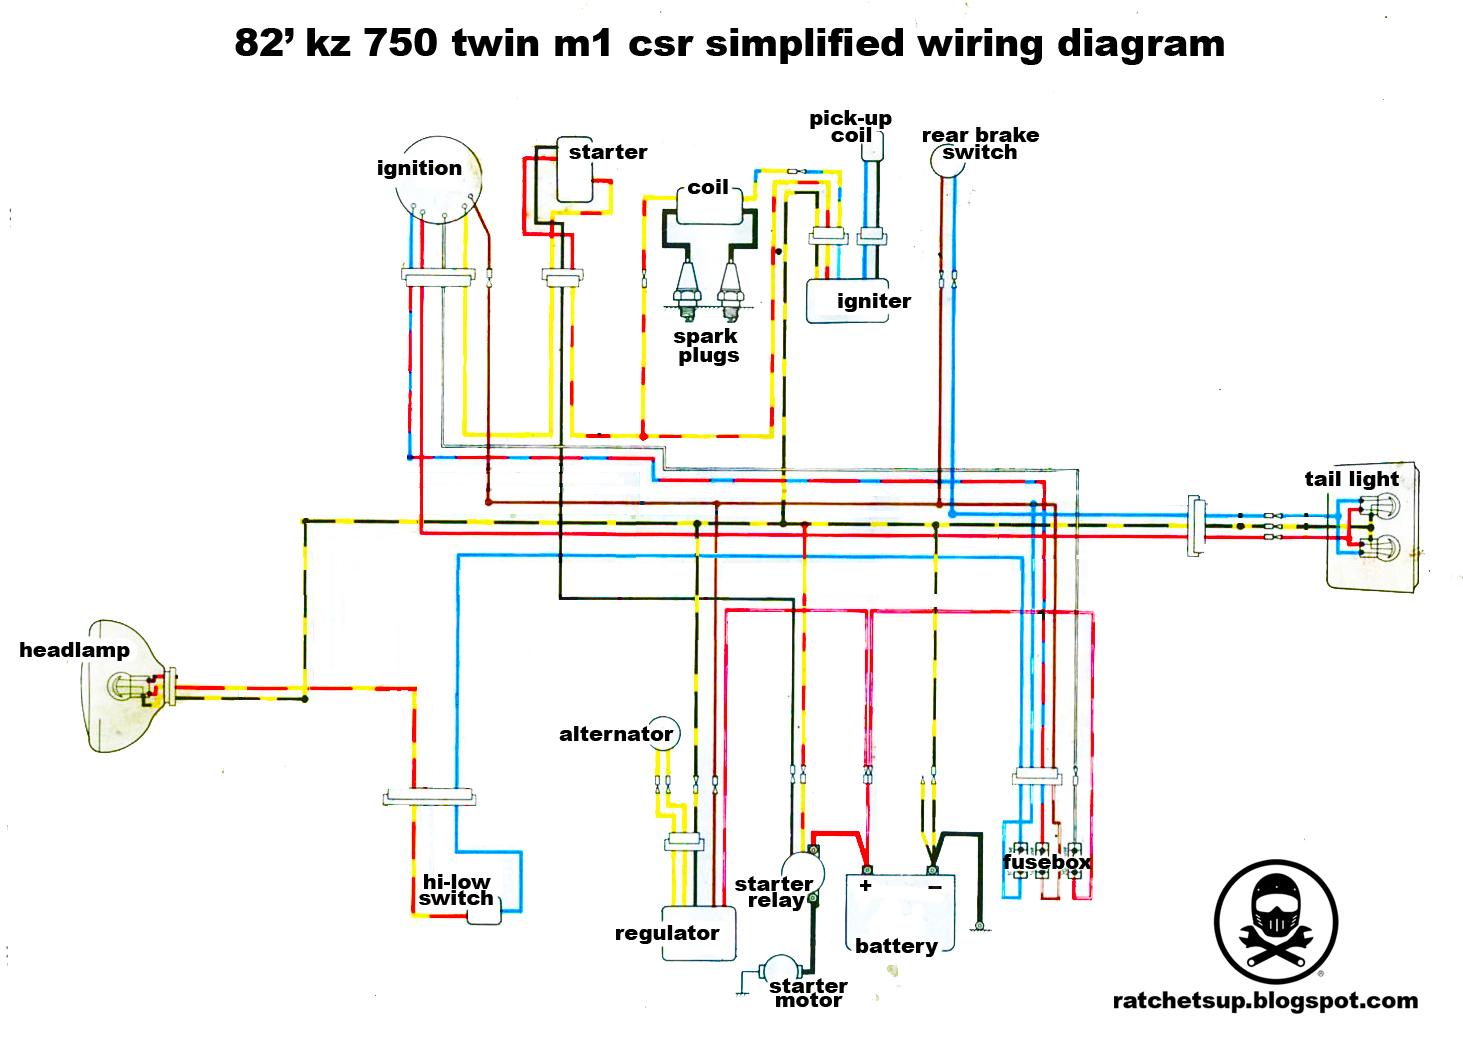 Simplifiedminimal kz750 csr wiring diagram  KZRider